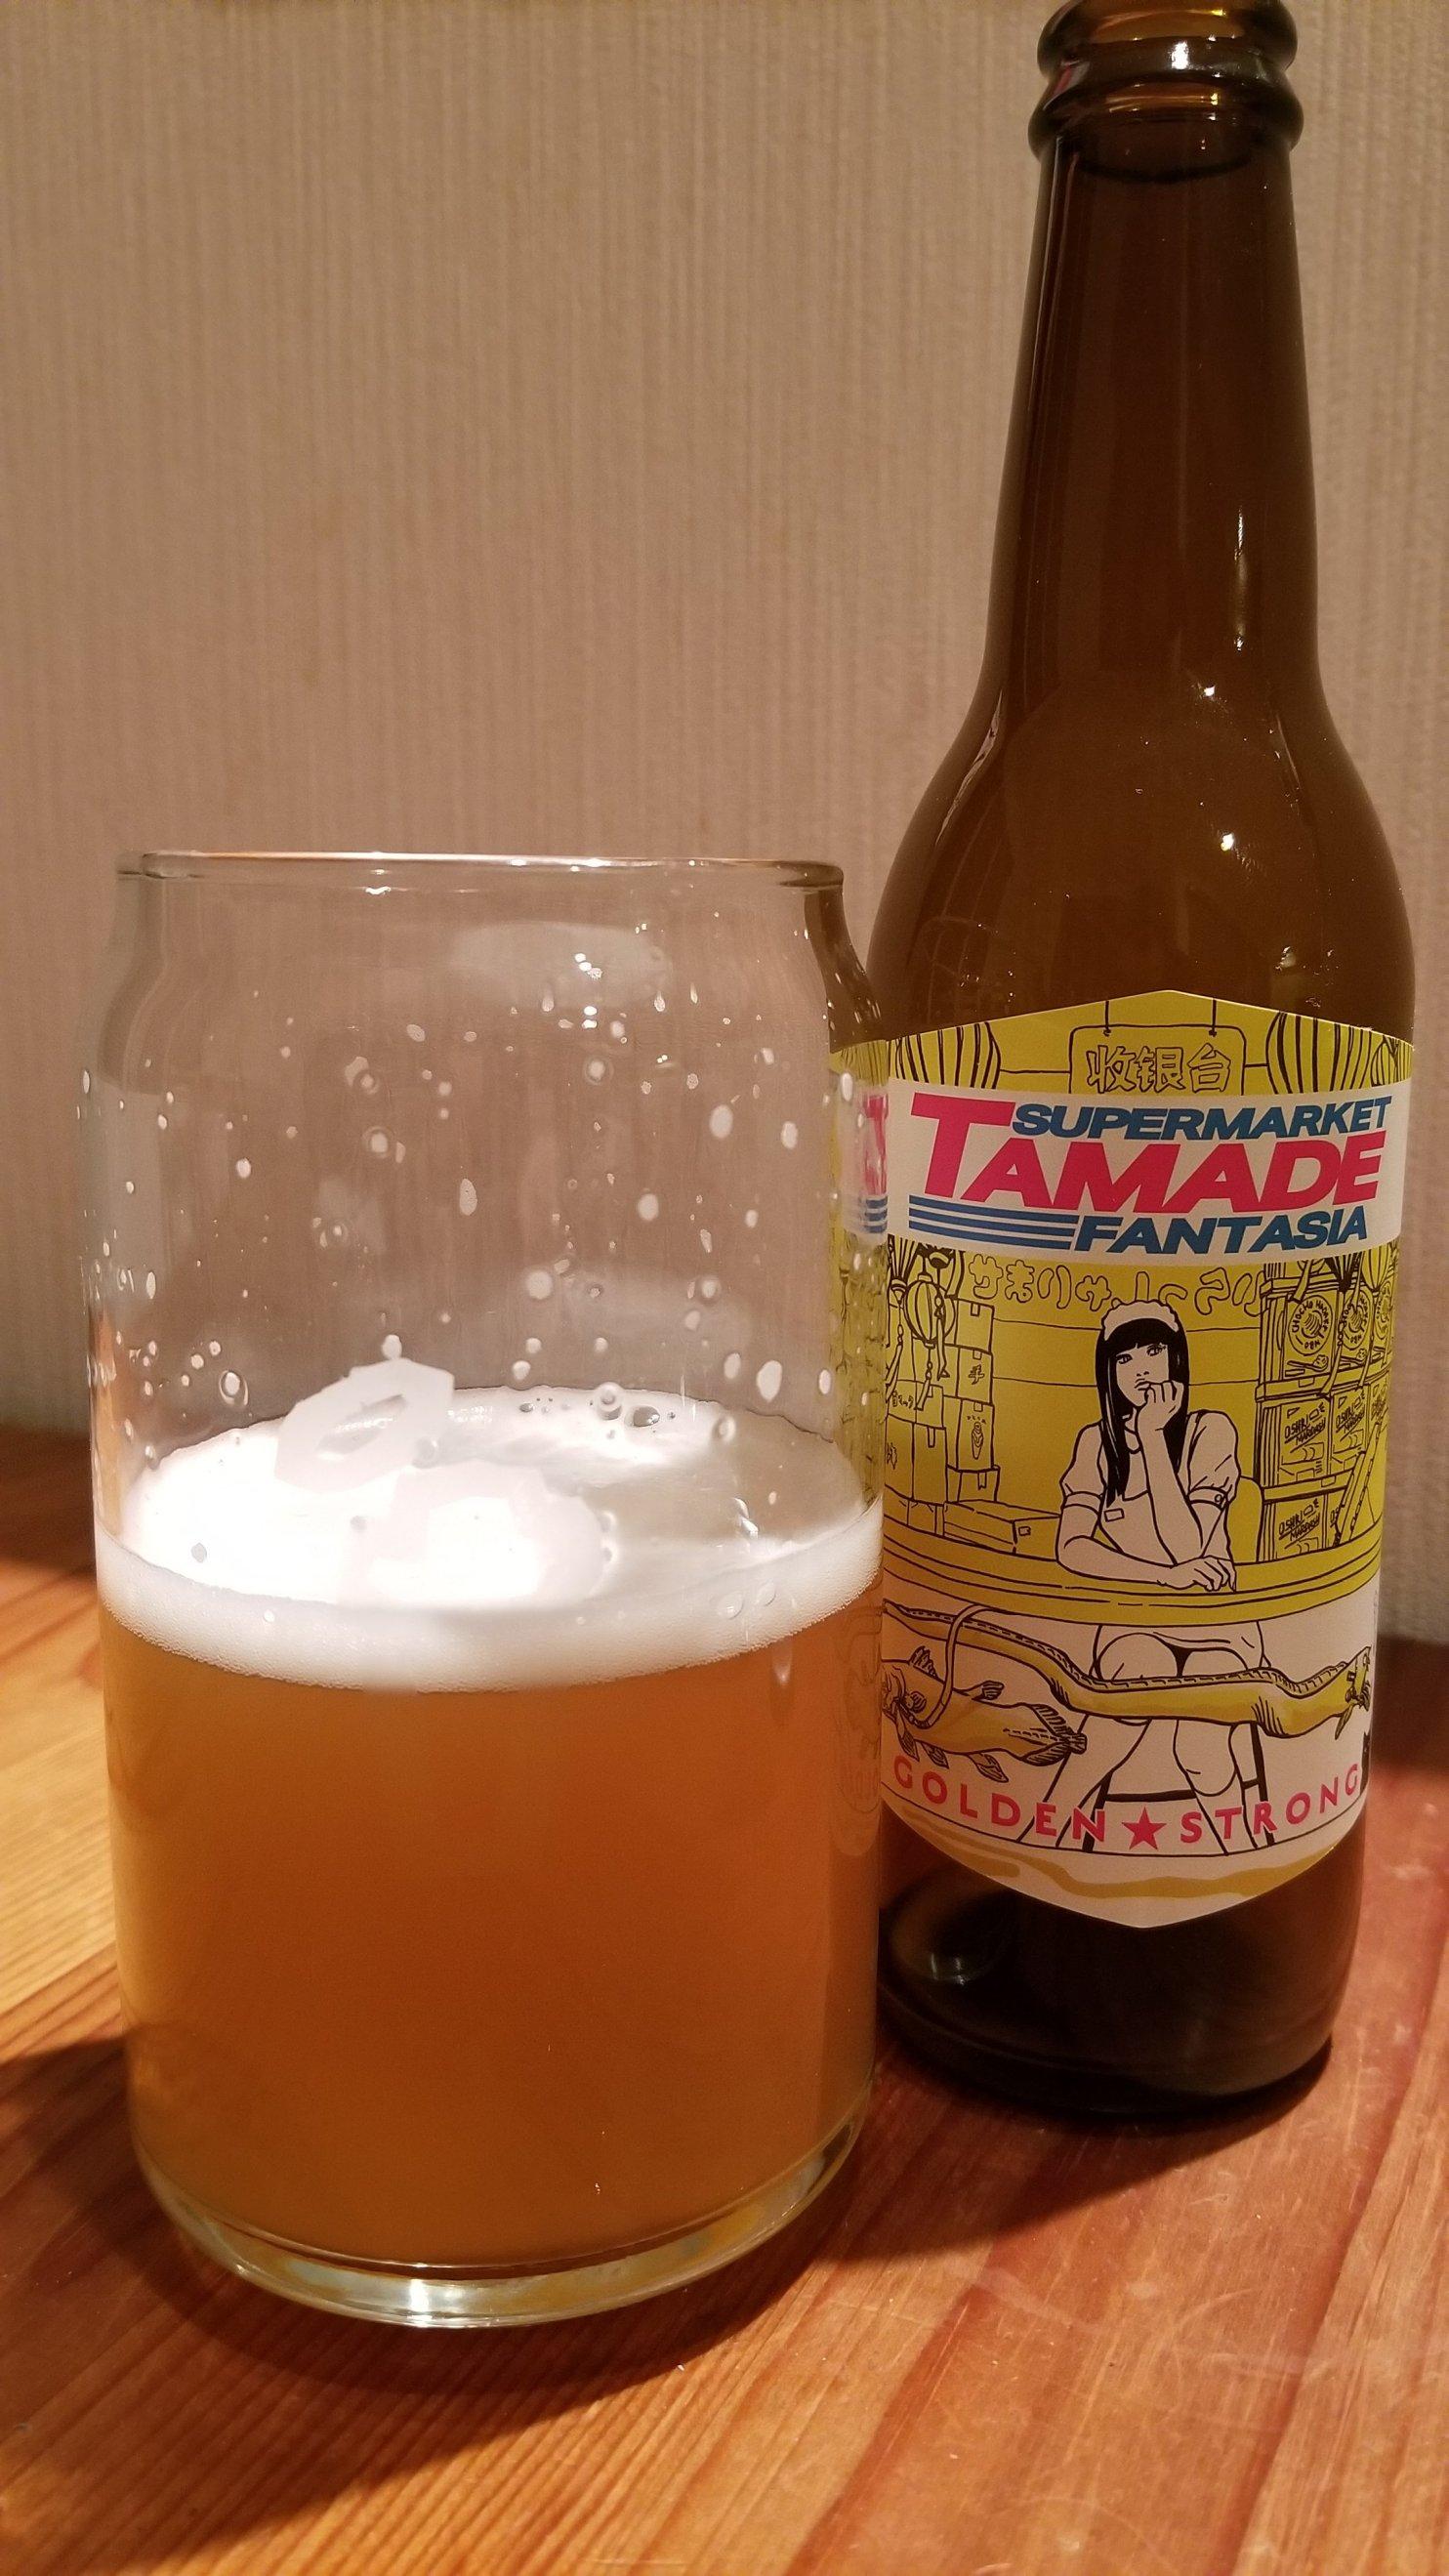 Derailleur Supermarket Tamade Fantasia・ディレイラスーパーマーケット タマデ ファンタジア